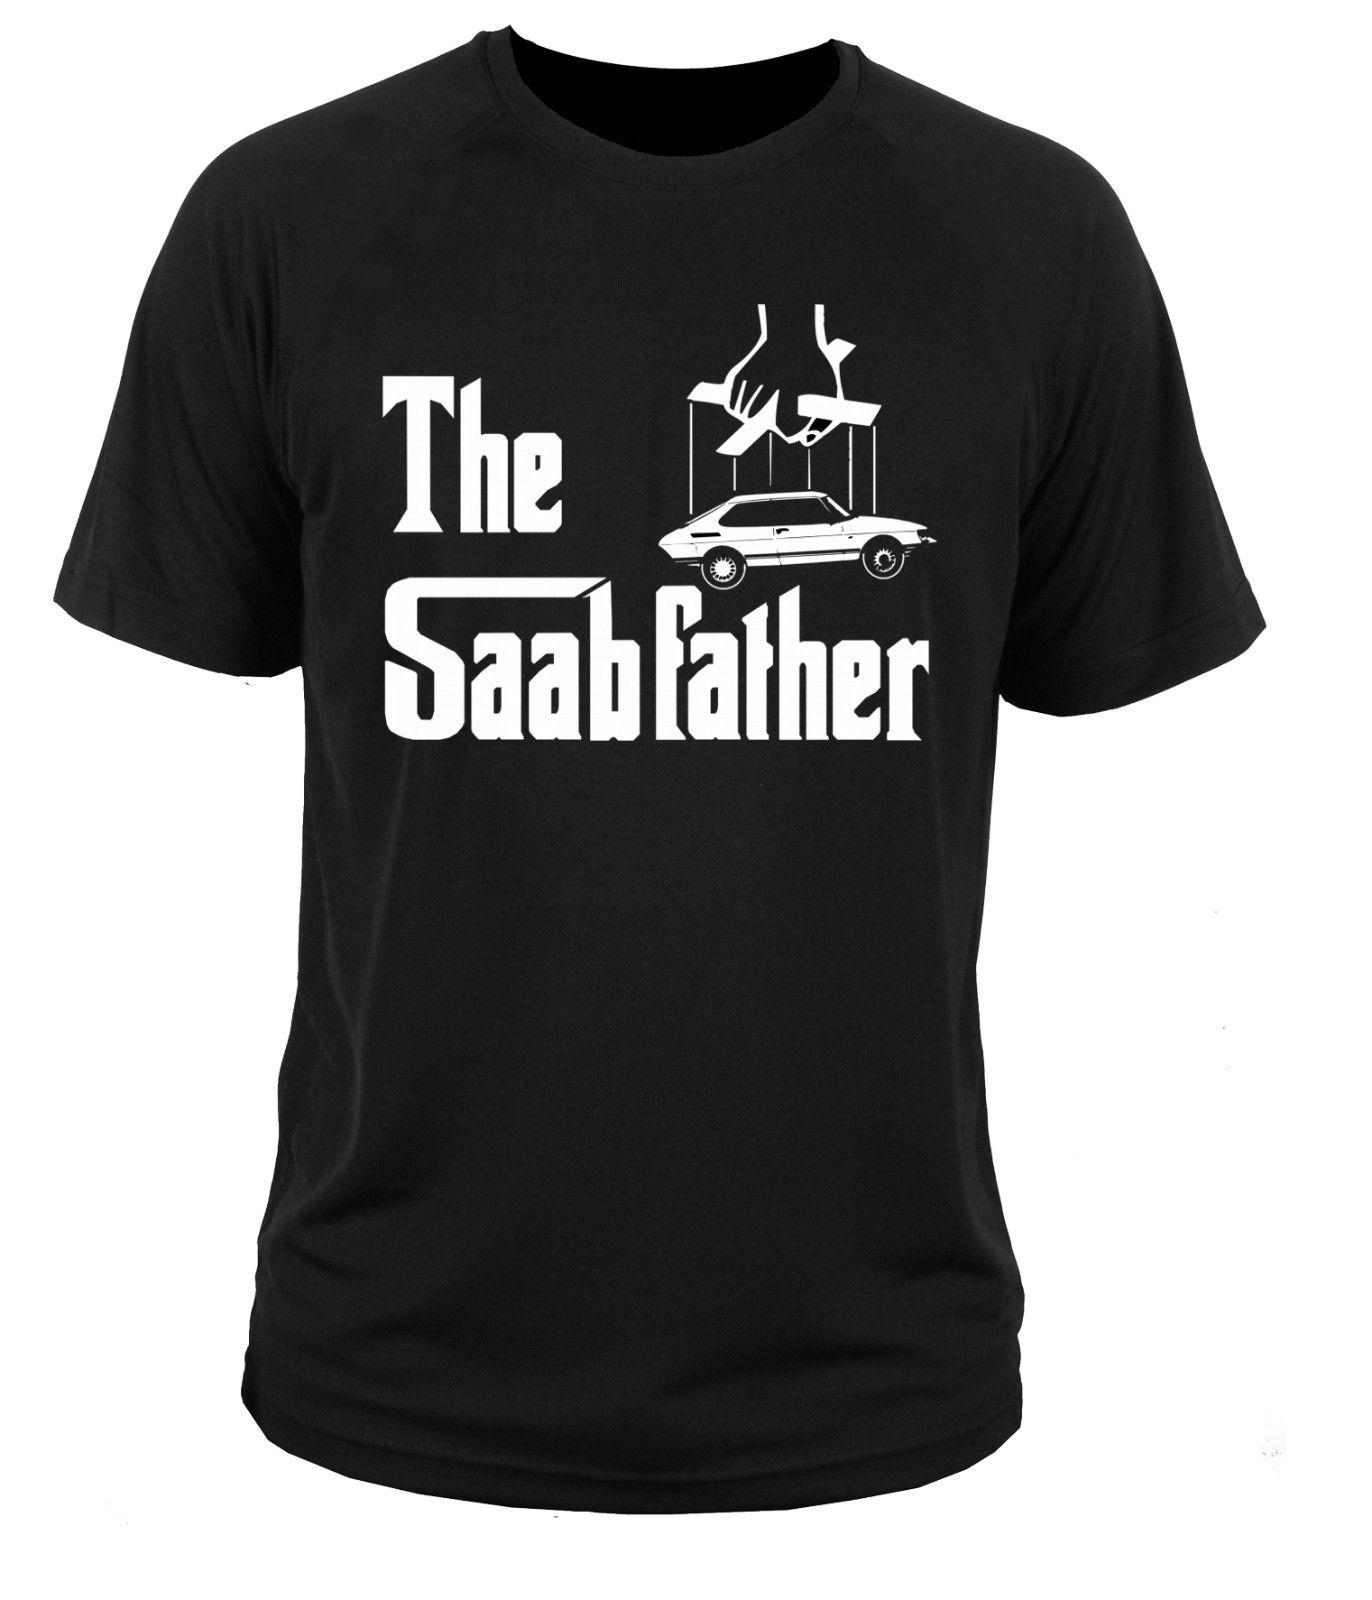 2018 New Cool Tee Shirt T Shirt T-shirt Car Saab 900  Turbo Aero 9-3 9-5 The Saabfather